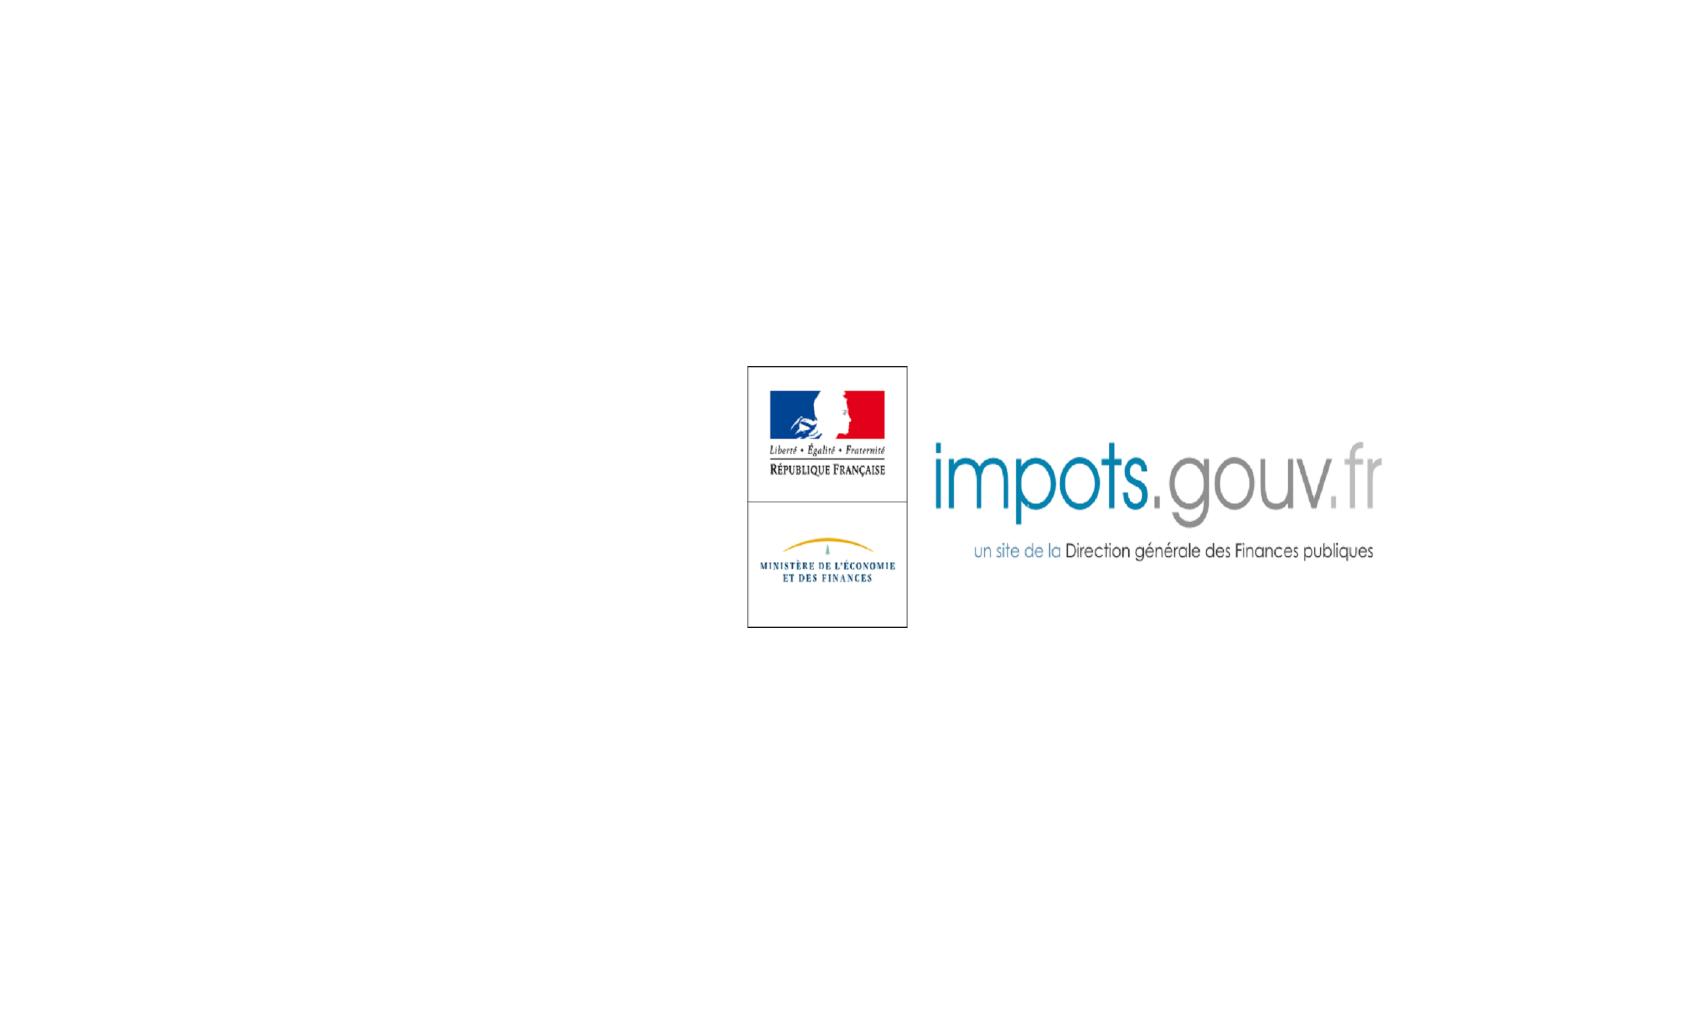 DECLARATION D'IMPÔT